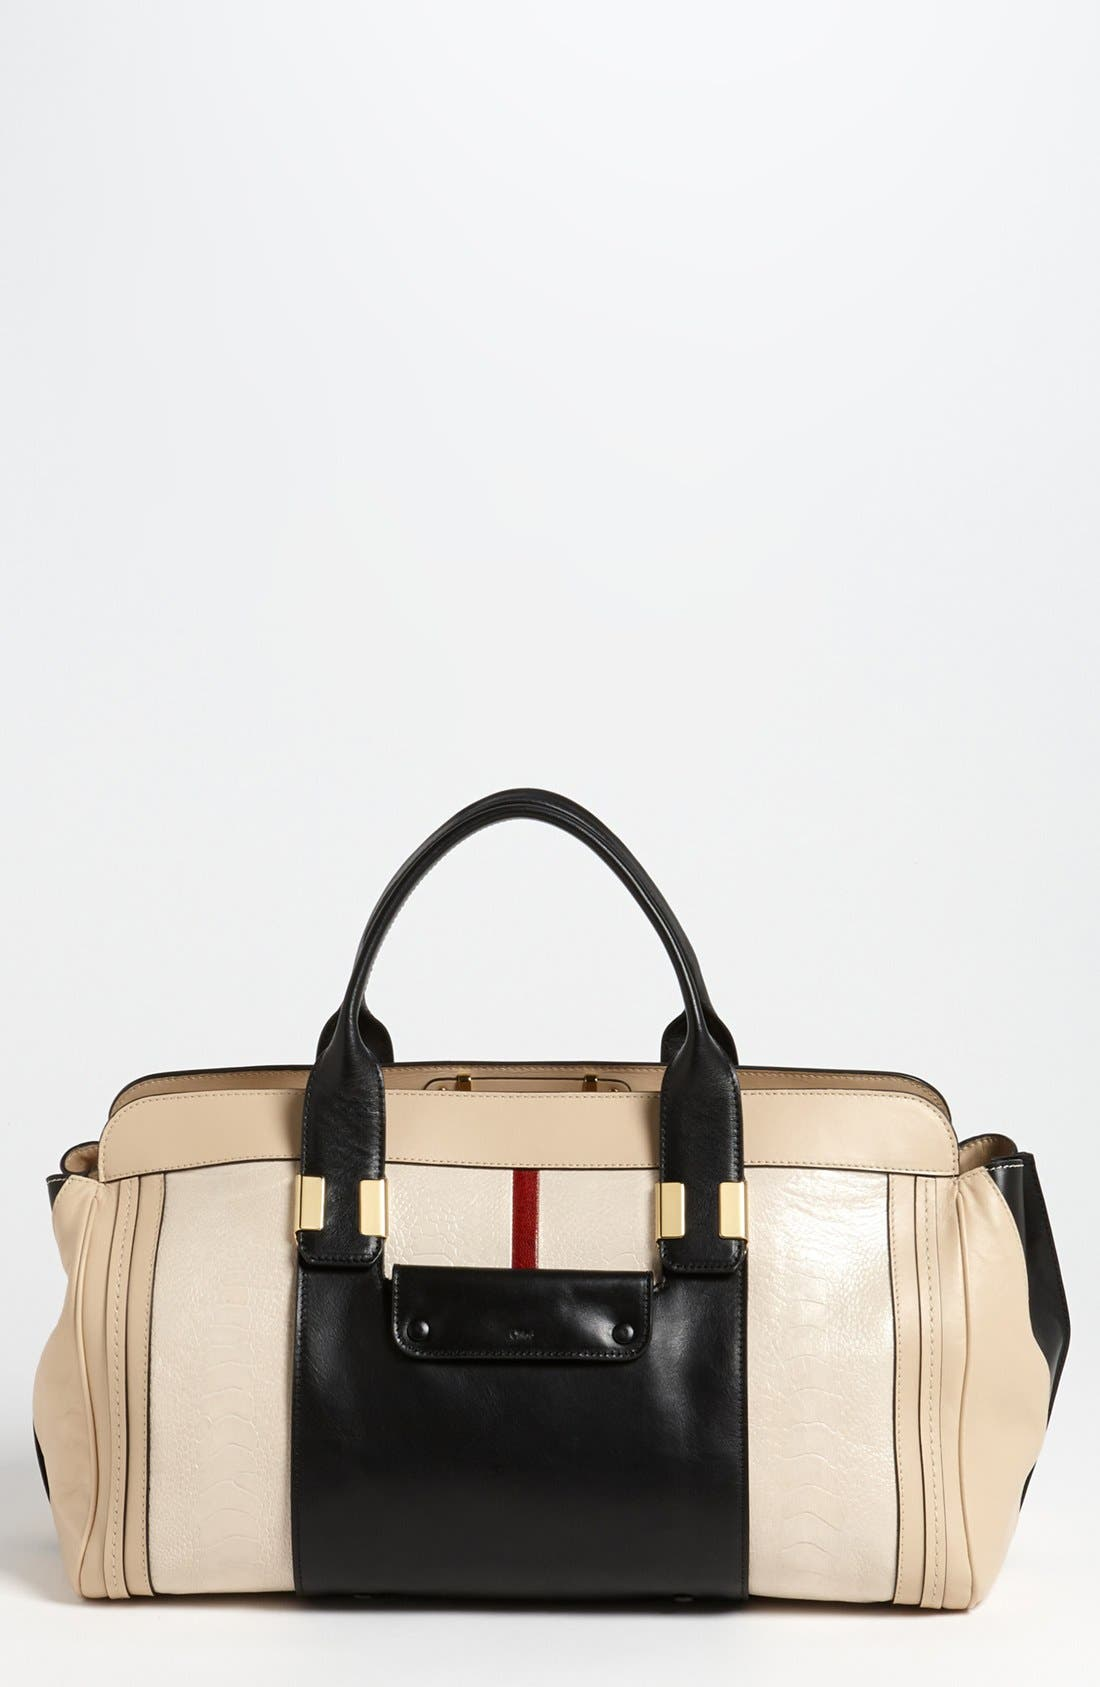 Main Image - Chloé 'Alice - Medium' Ostrich Leather Satchel